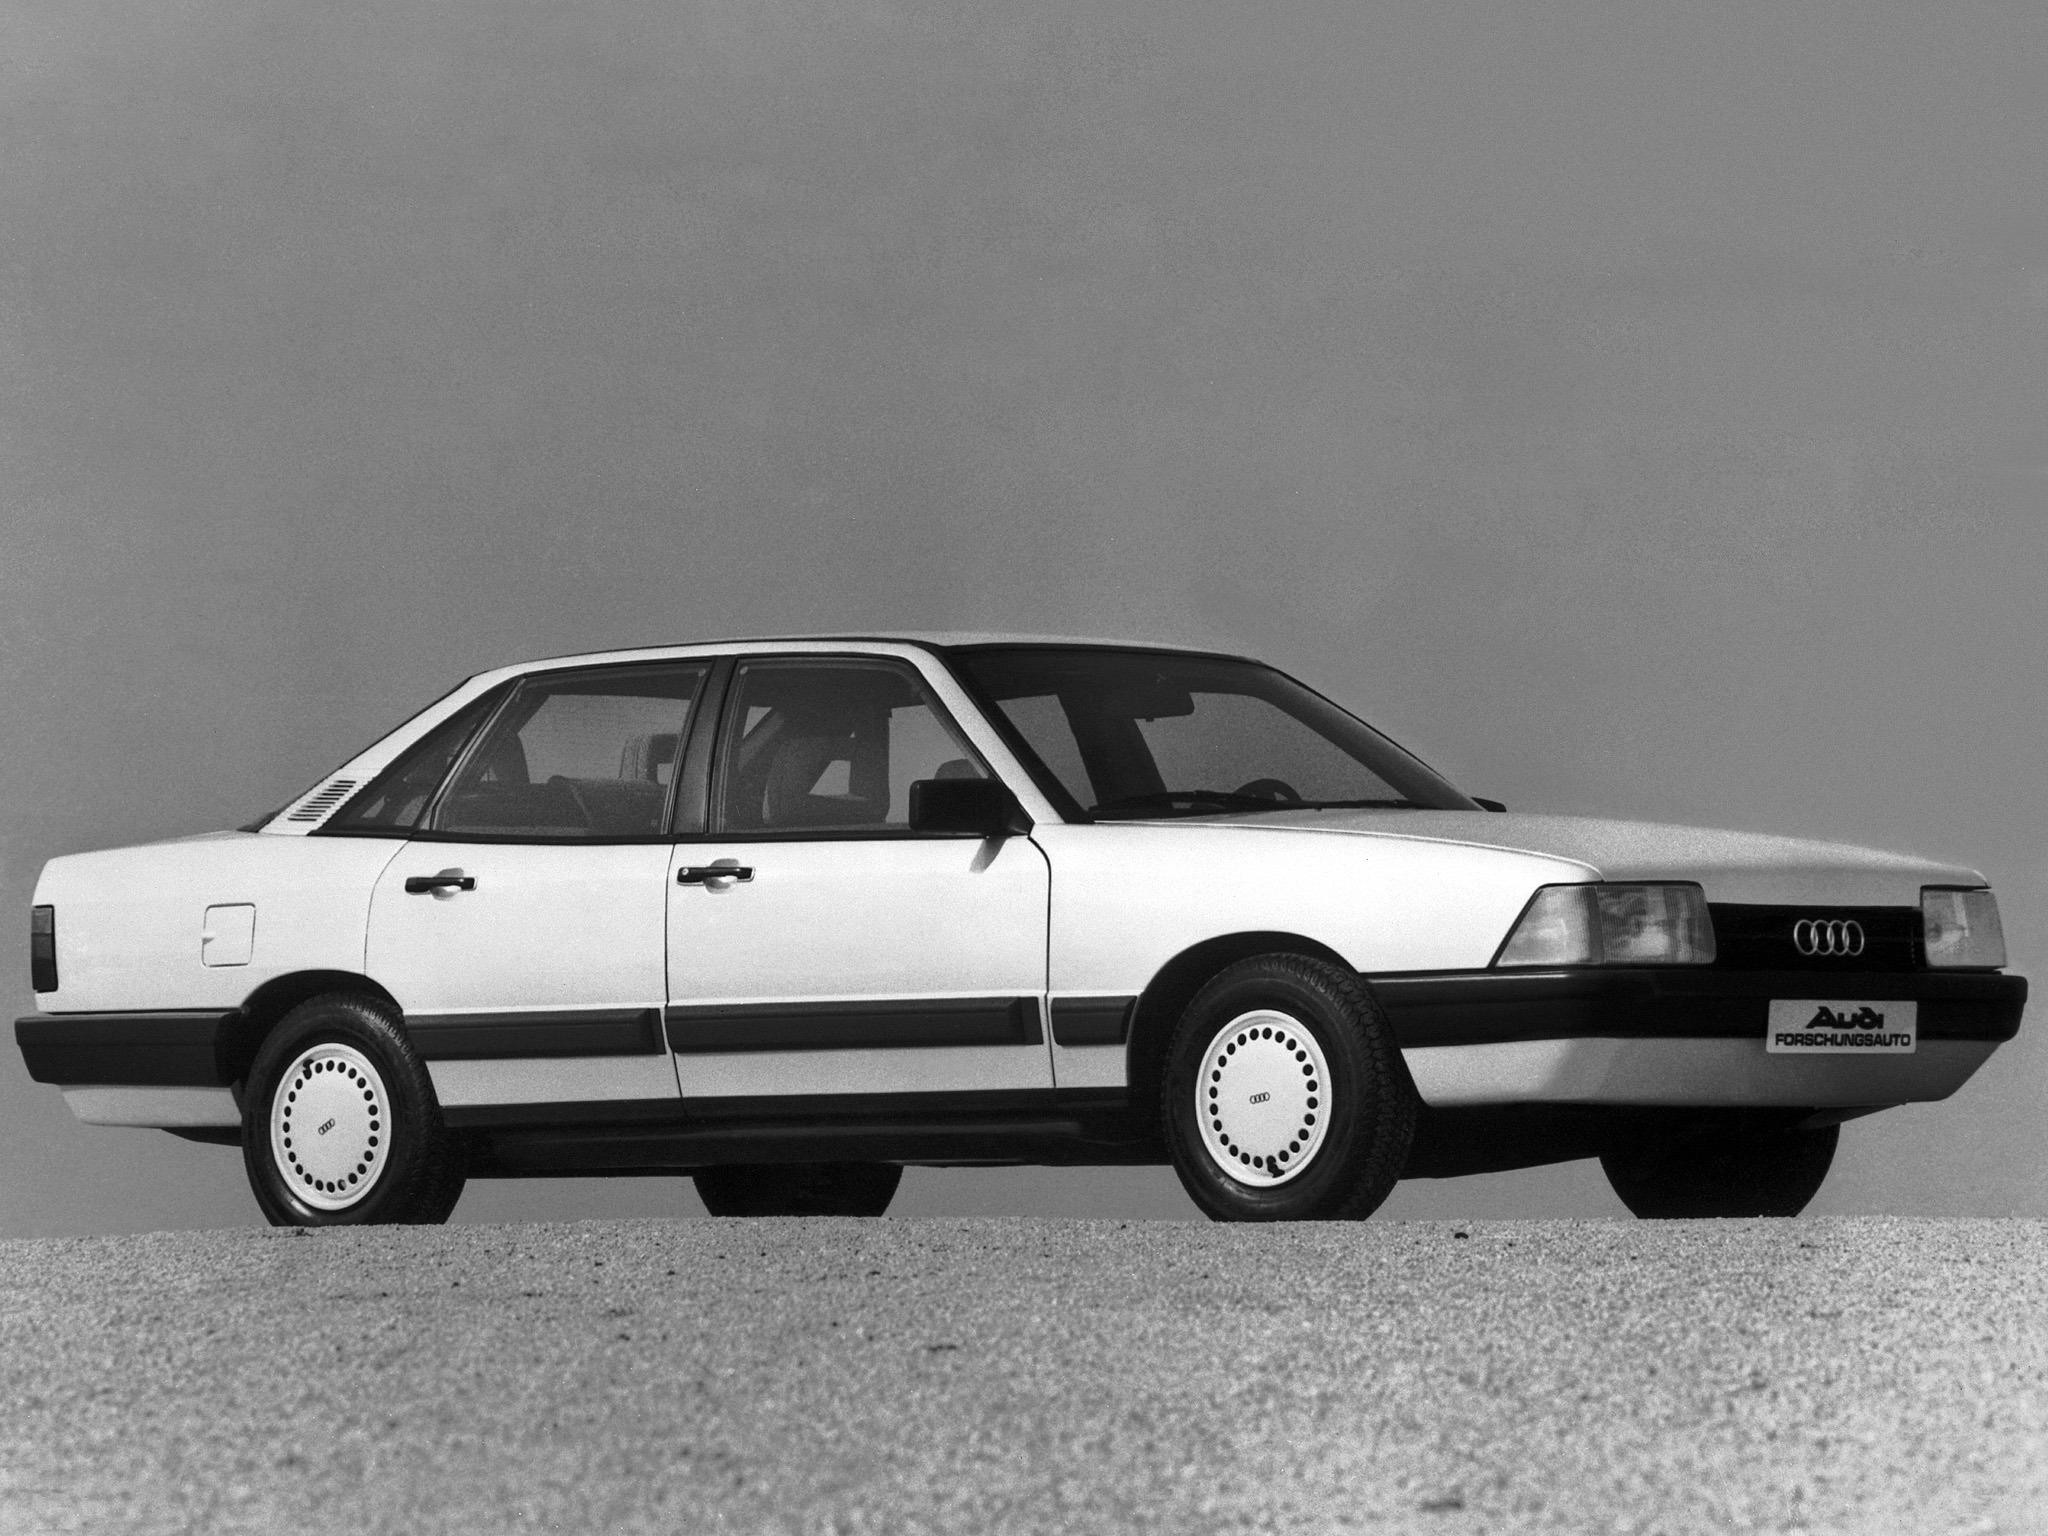 Audi 2000 Concept (198...